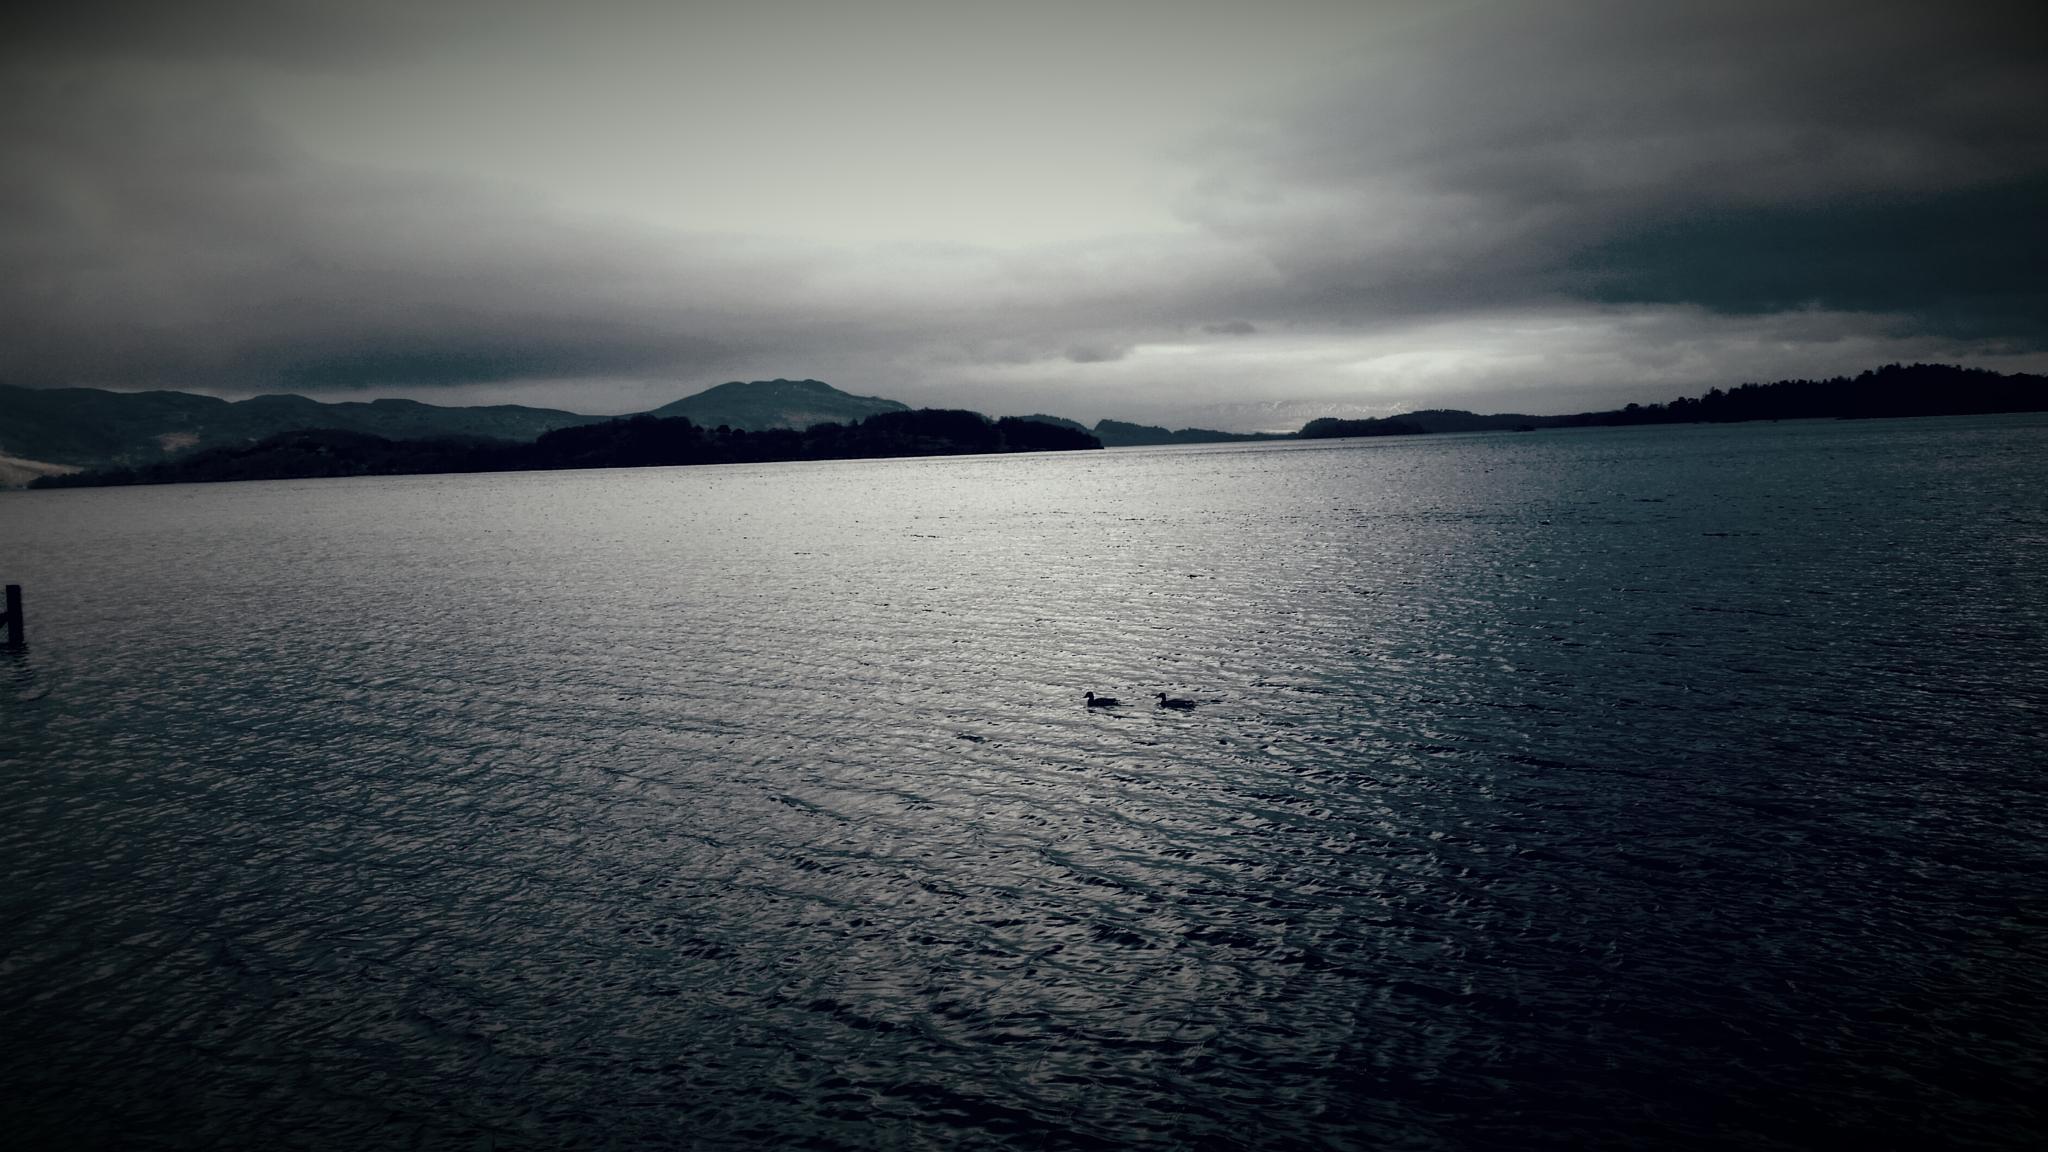 Loch Lomond by sharon campbell